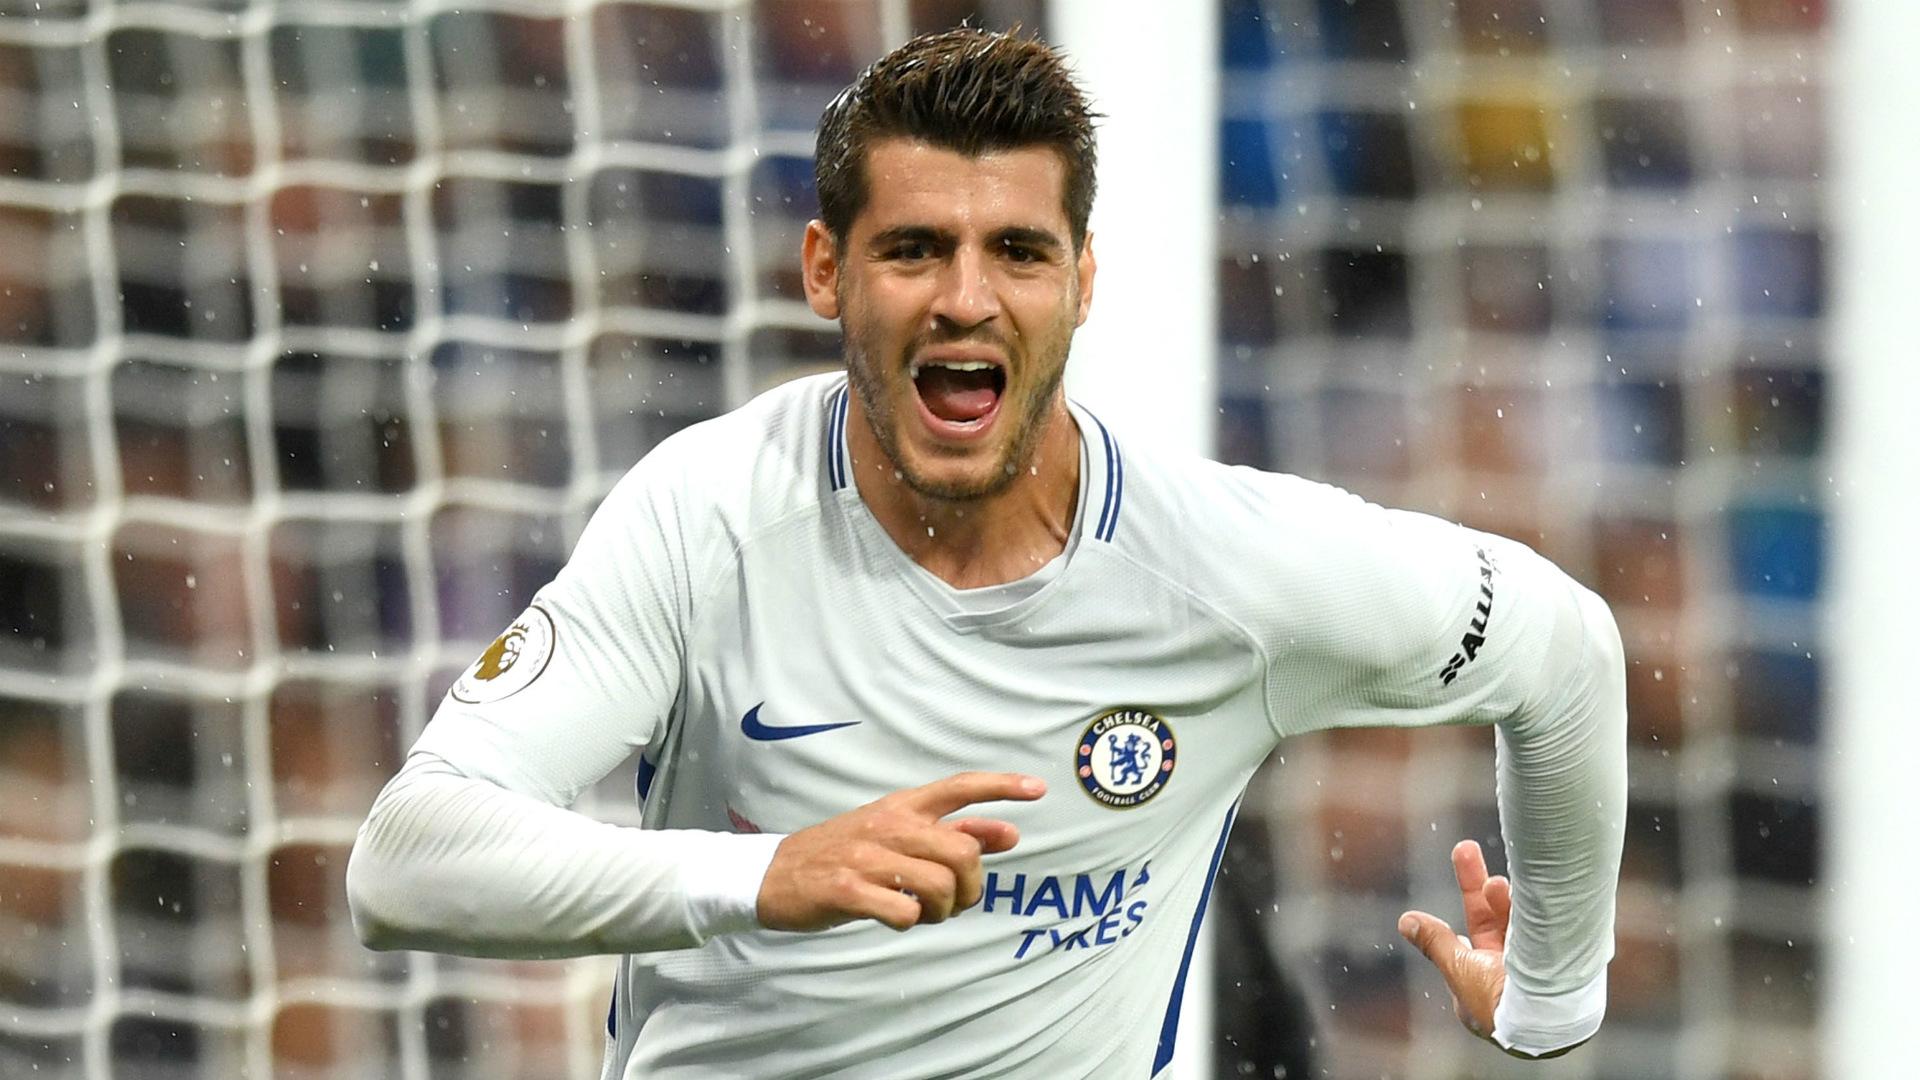 Chelsea pide a afición que cambie canción sobre Morata